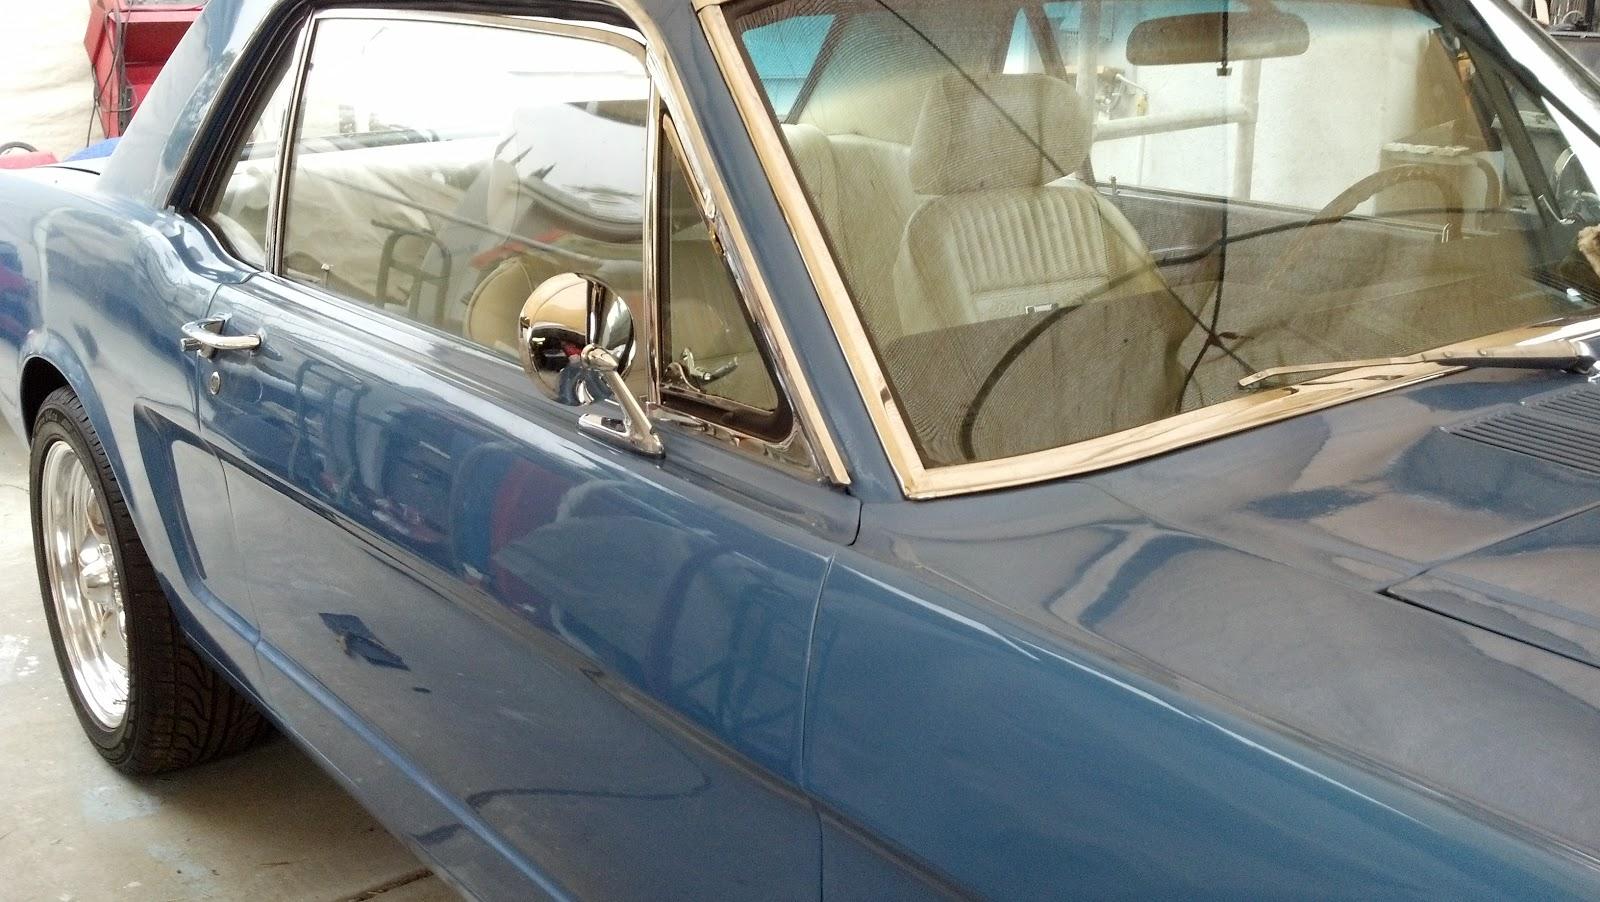 39 66 window vertical adjustment vintage mustang forums for 1965 mustang window adjustment